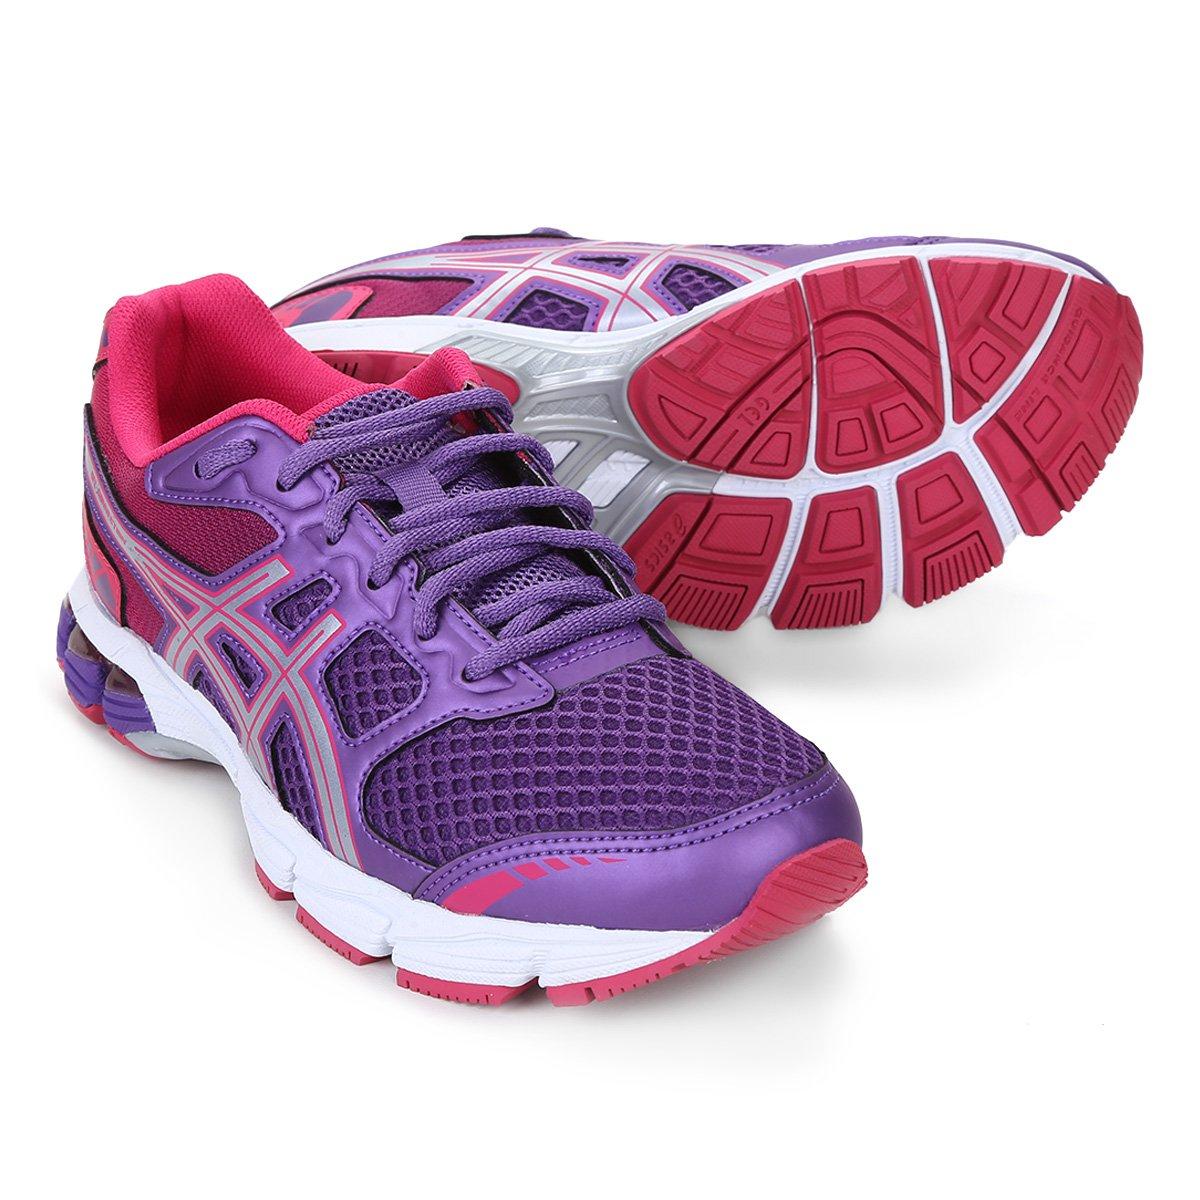 tenis asics feminino roxo e rosa que significa